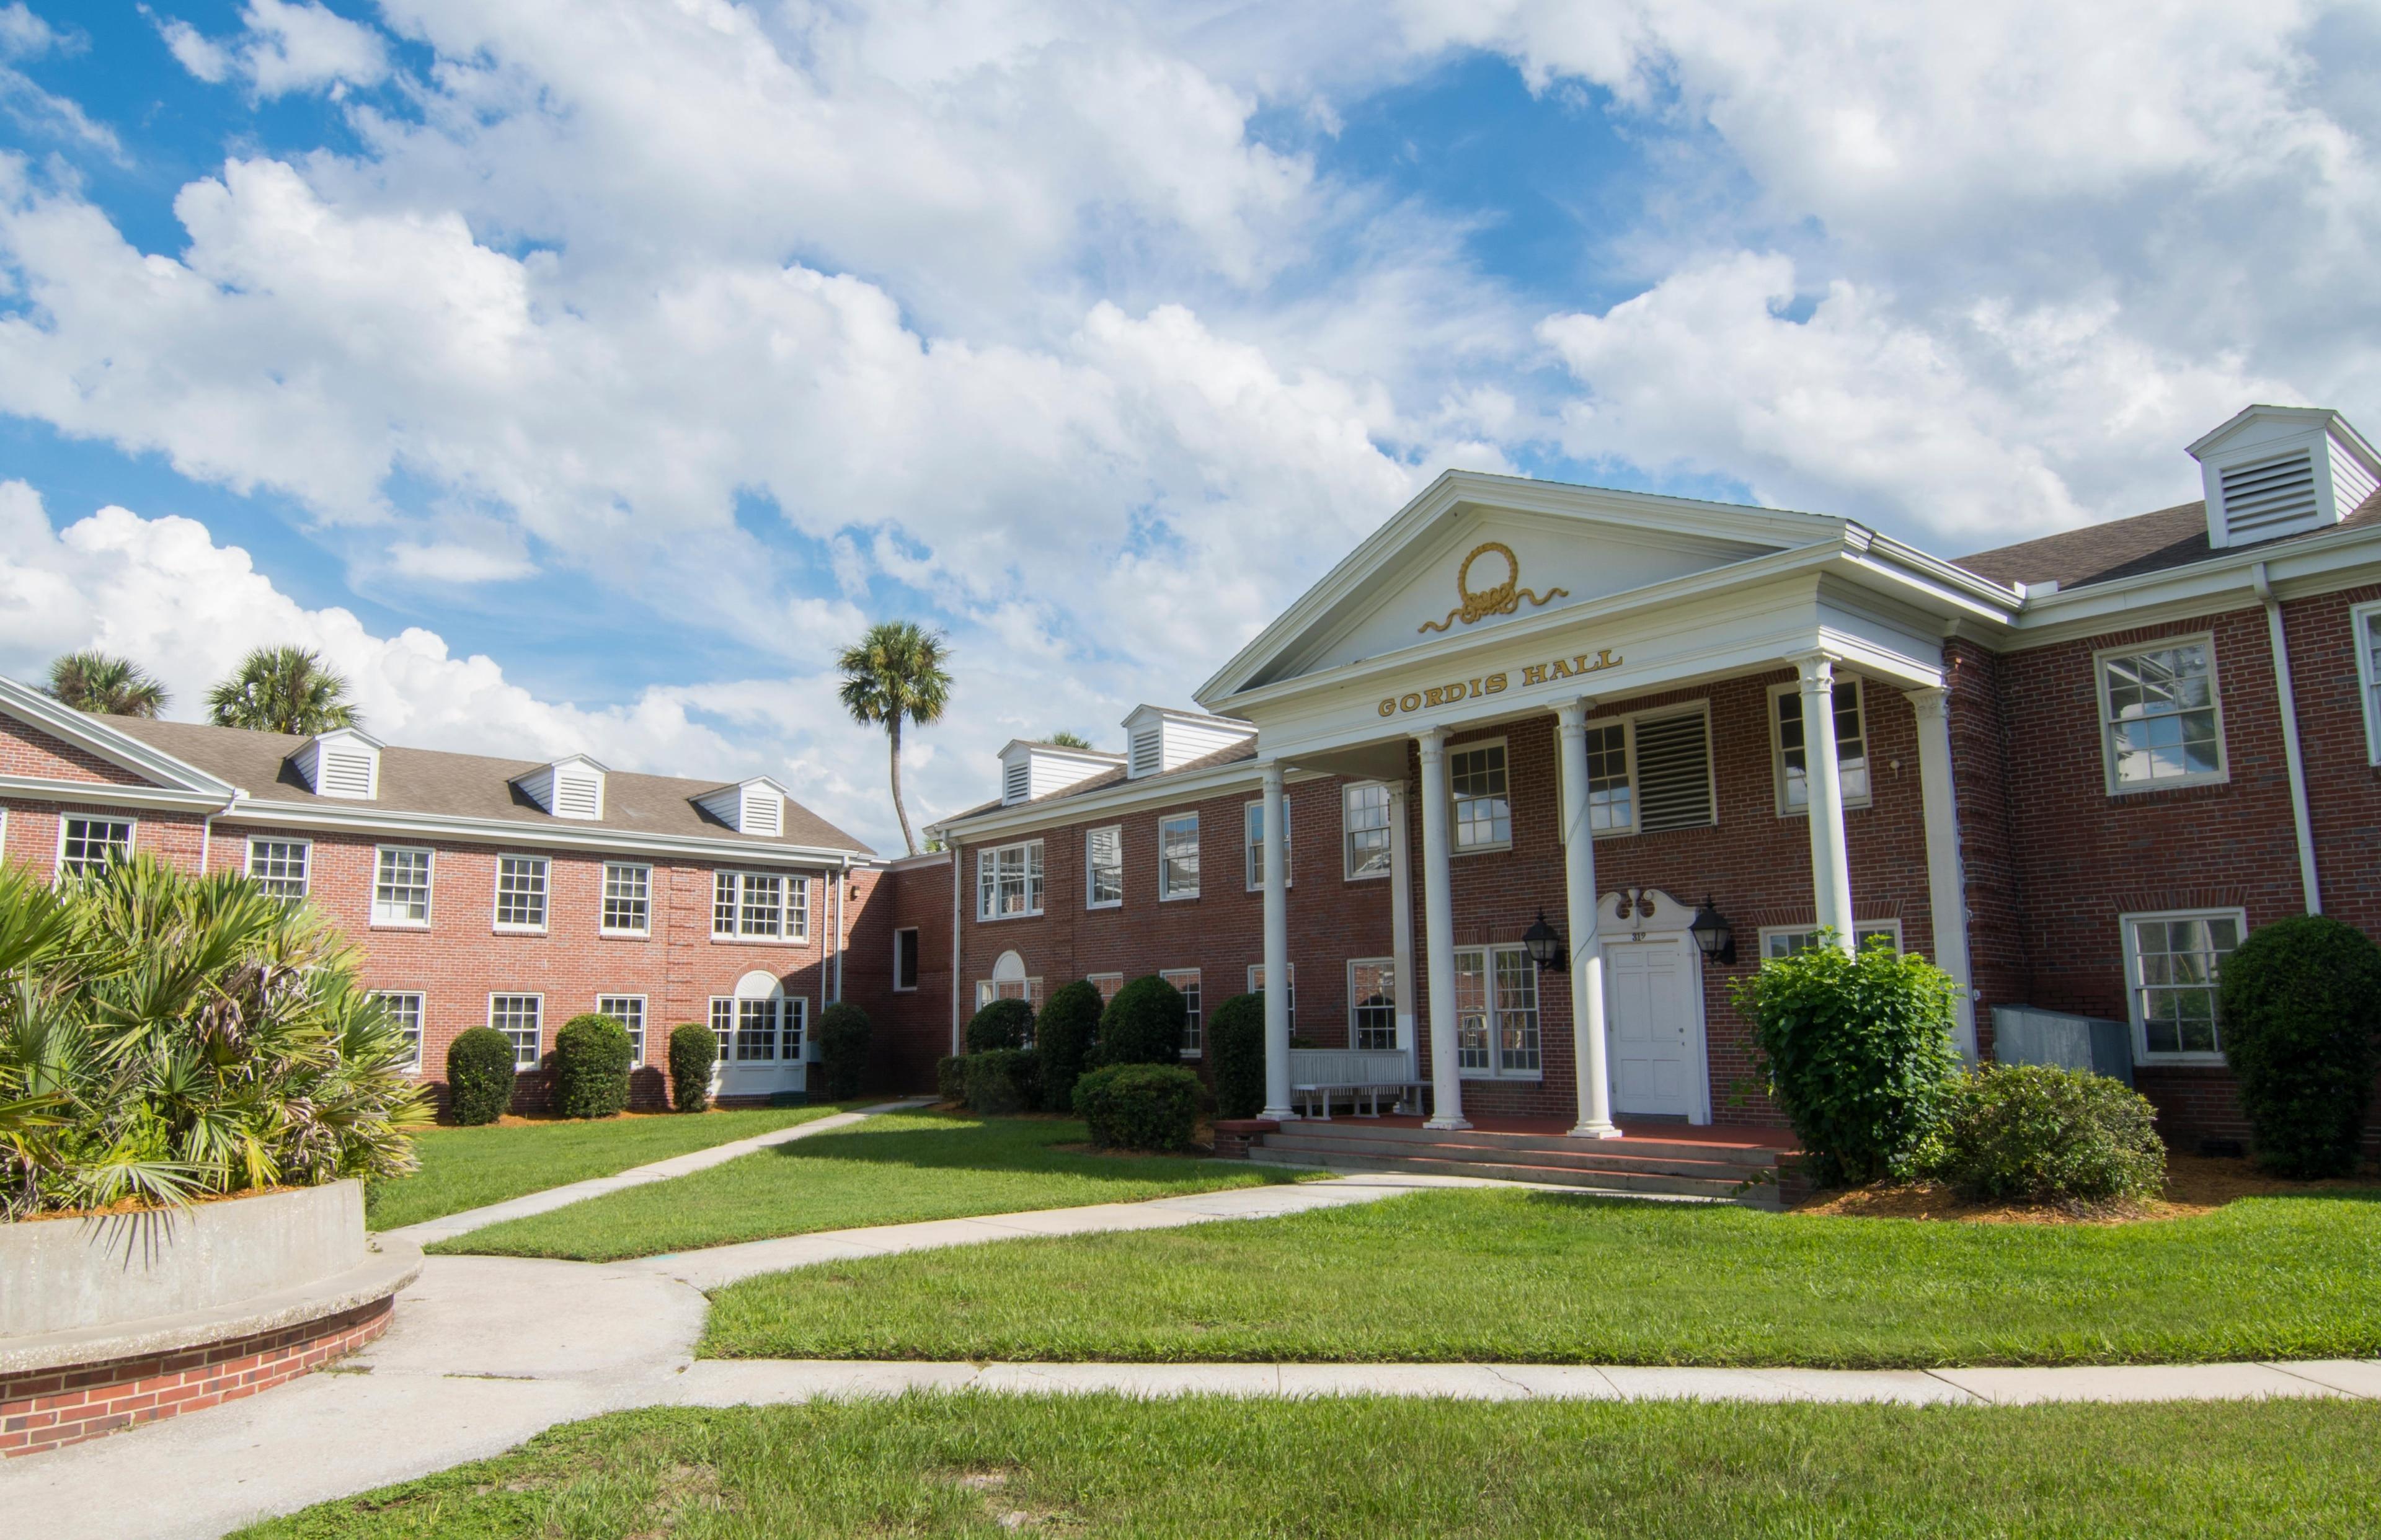 DeLand, Florida, United States of America